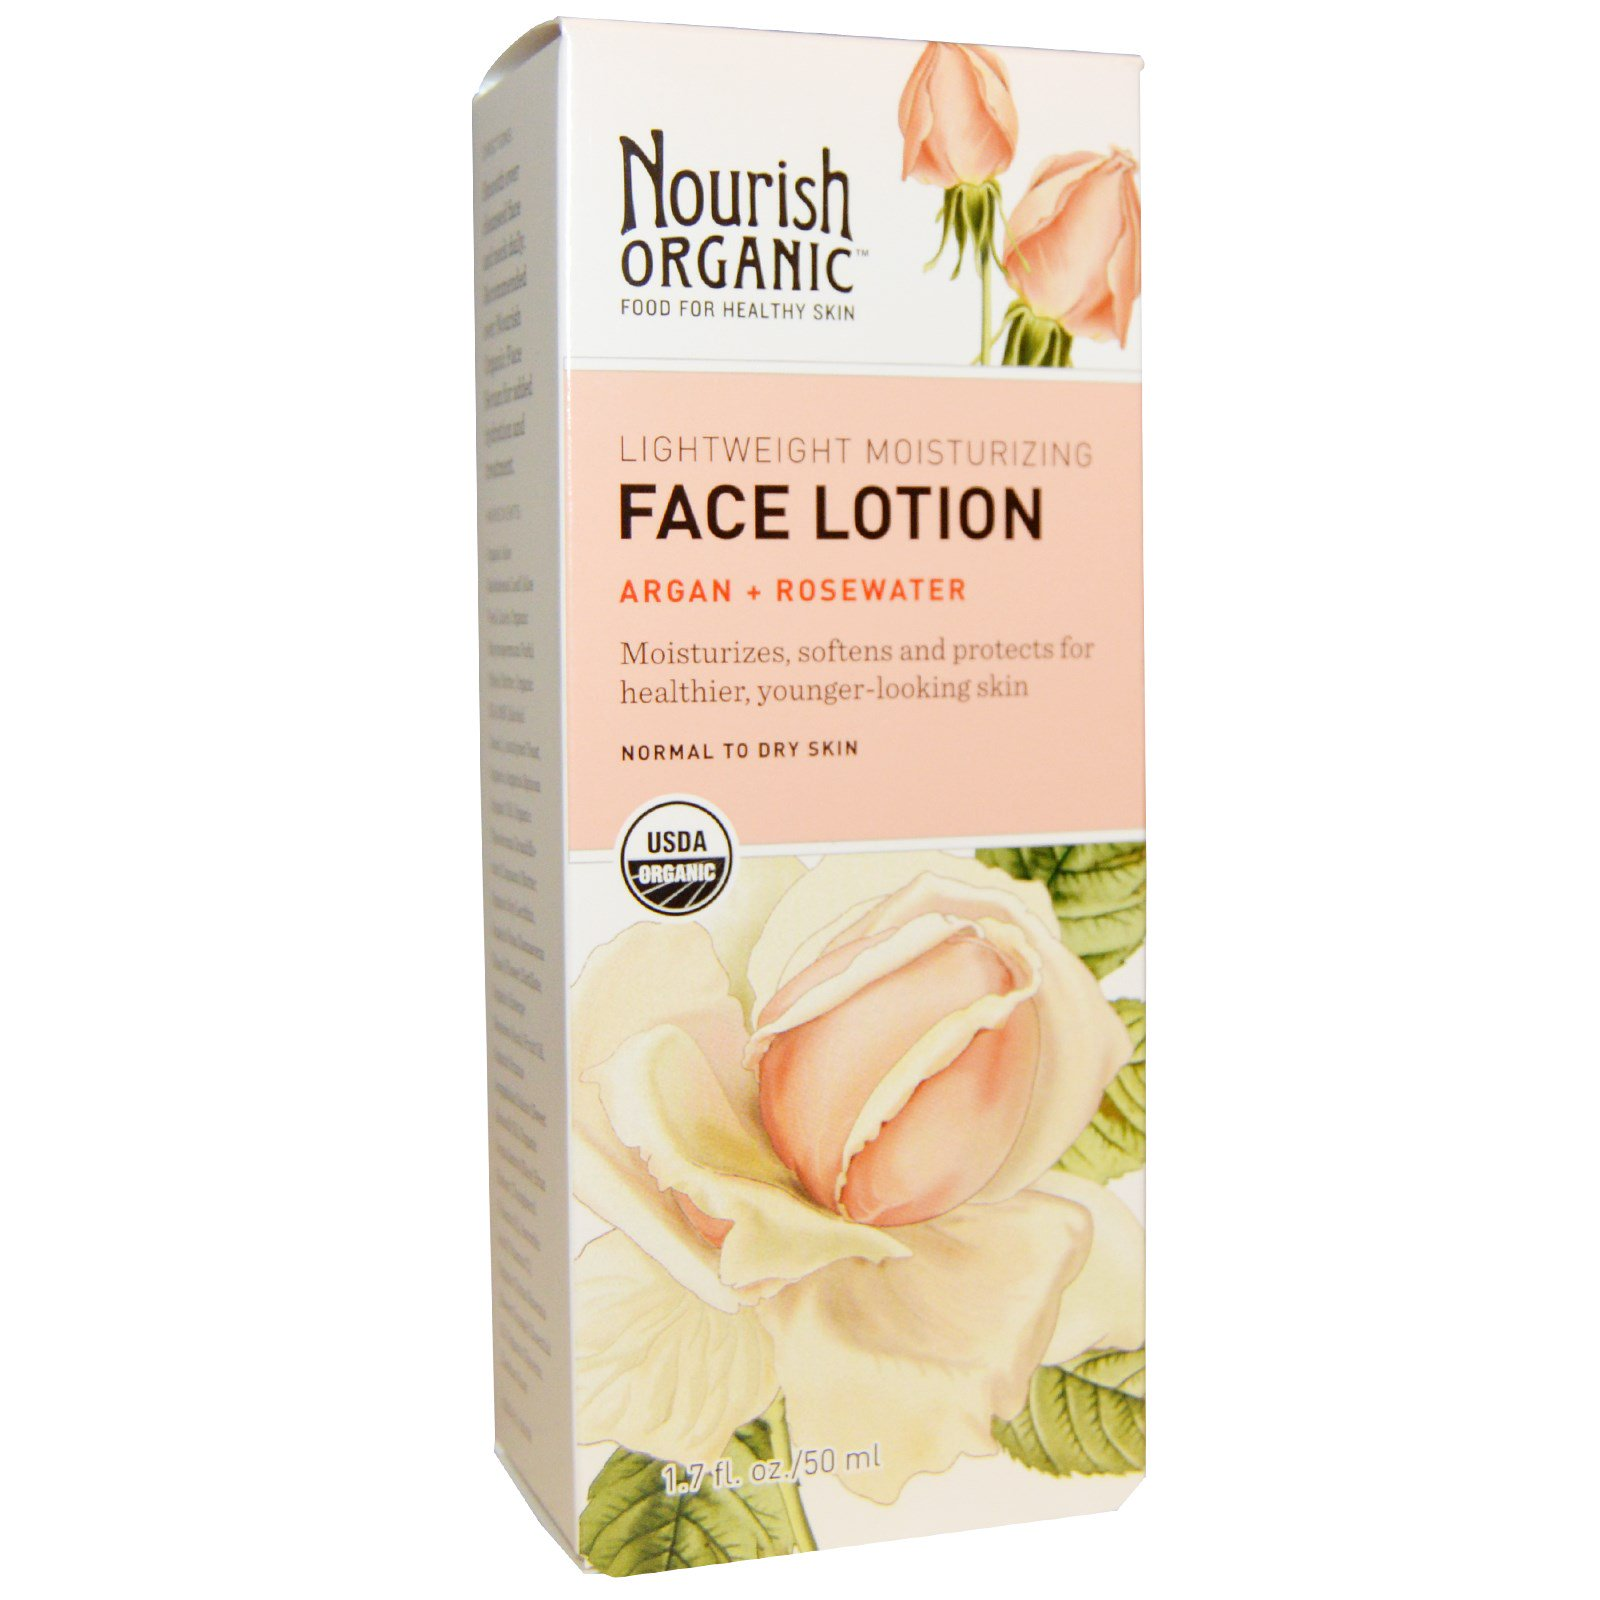 Nourish Organic, Lightweight Moisturizing Face Lotion, Argan + Rosewater, 1.7 fl. oz (50 ml)